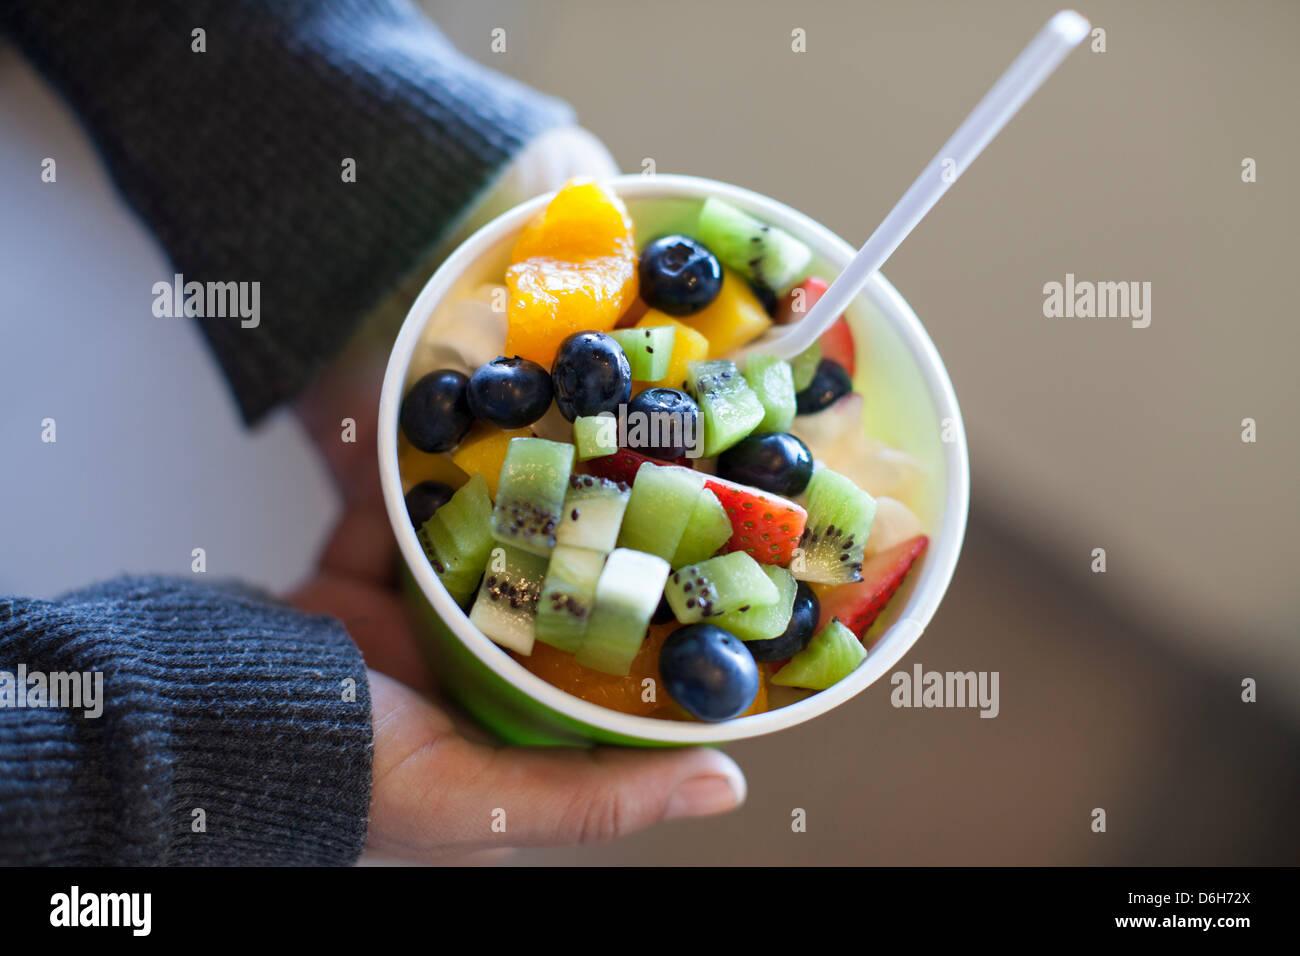 Cerca de yogur helado Imagen De Stock